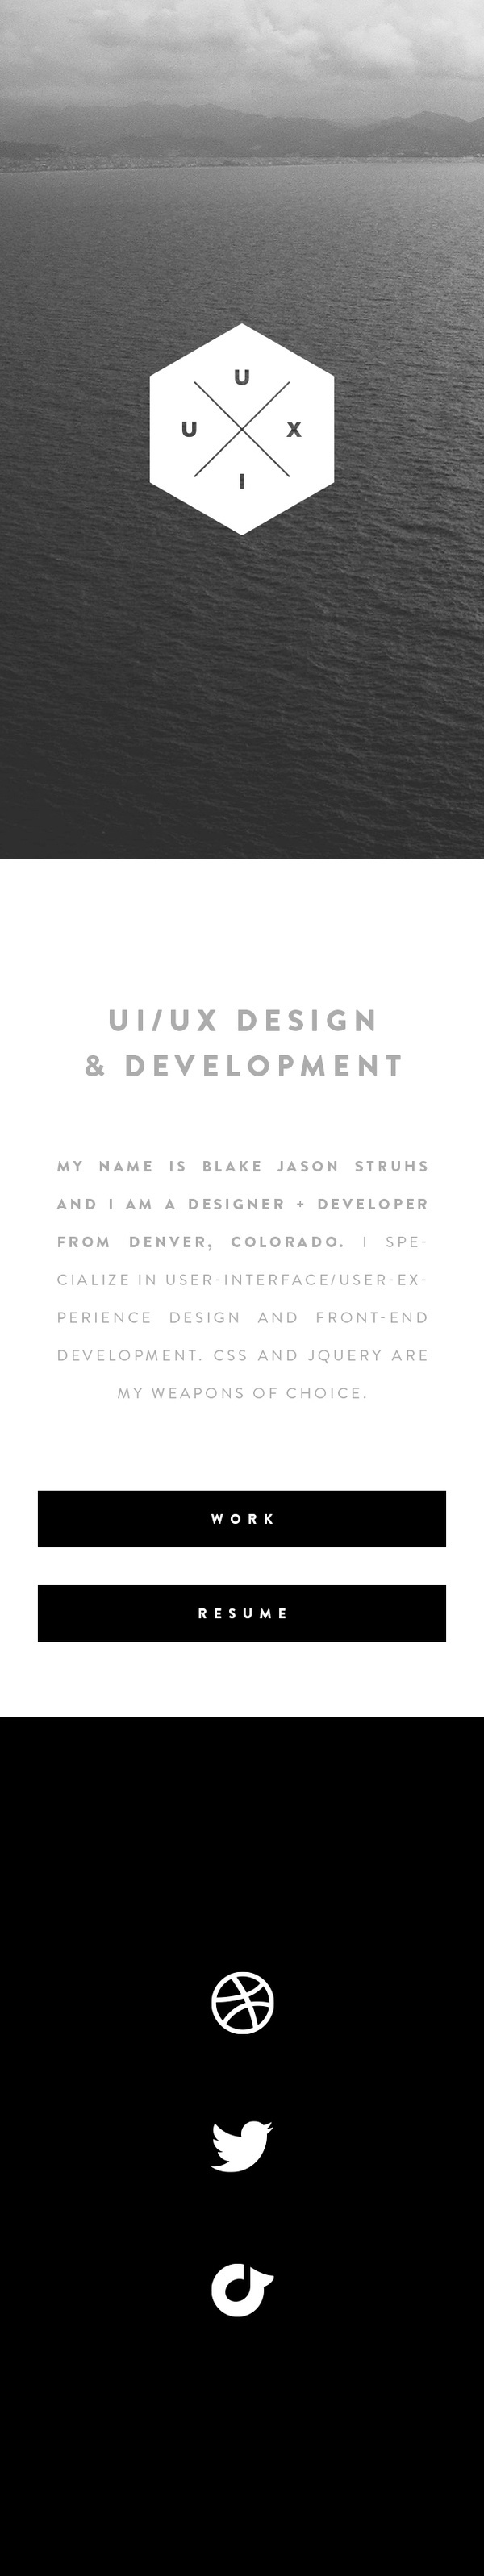 Blakejasonstruhs #responsive #design #mobile #minimal #web